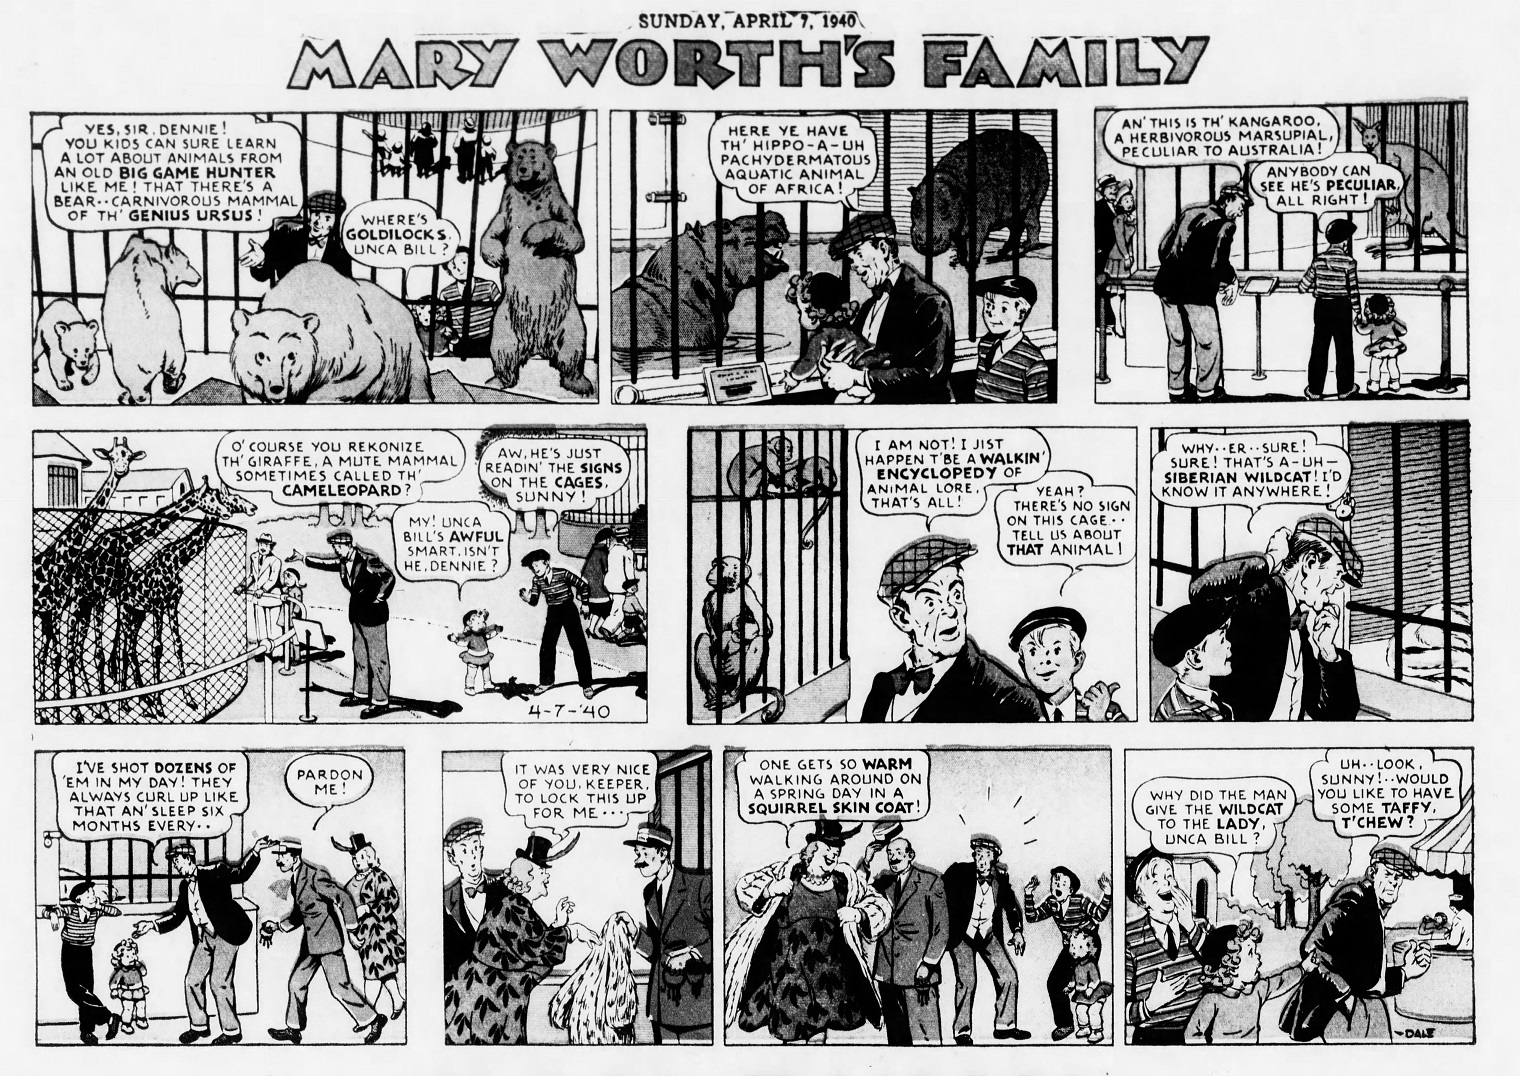 The_Brooklyn_Daily_Eagle_Sun__Apr_7__1940_(8).jpg